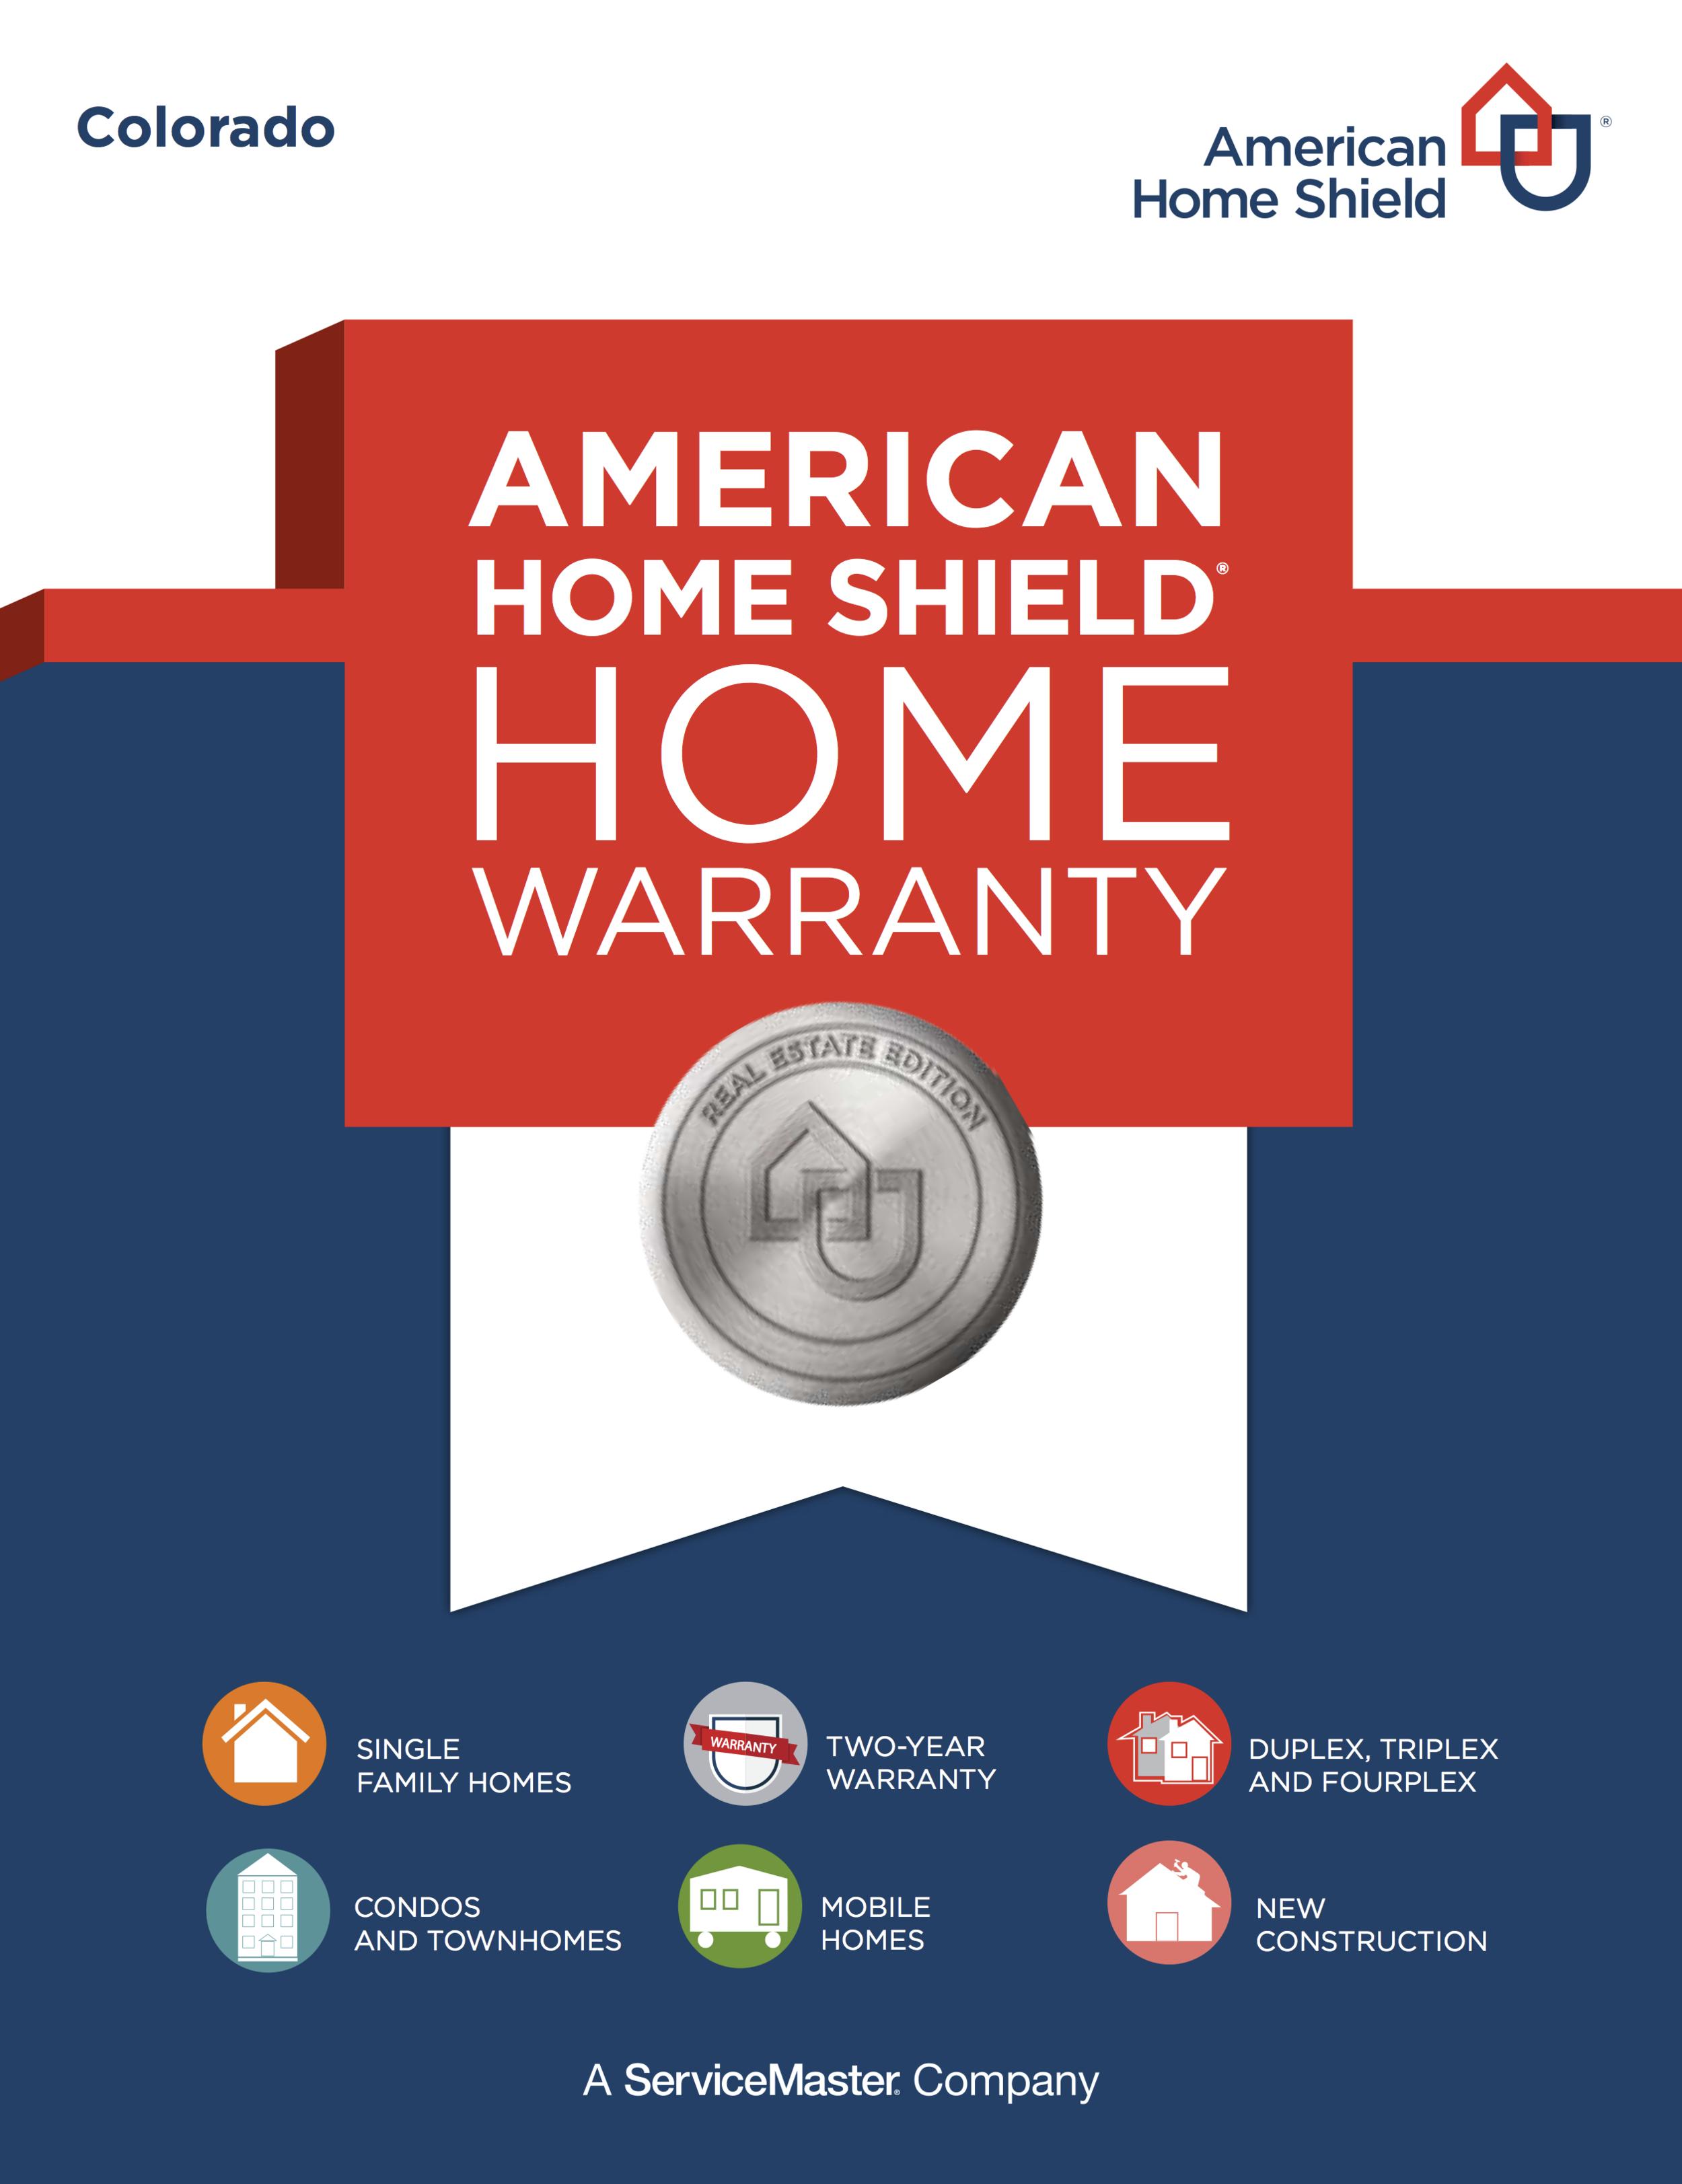 2017 AHS home warranty plans - real estate 1.png